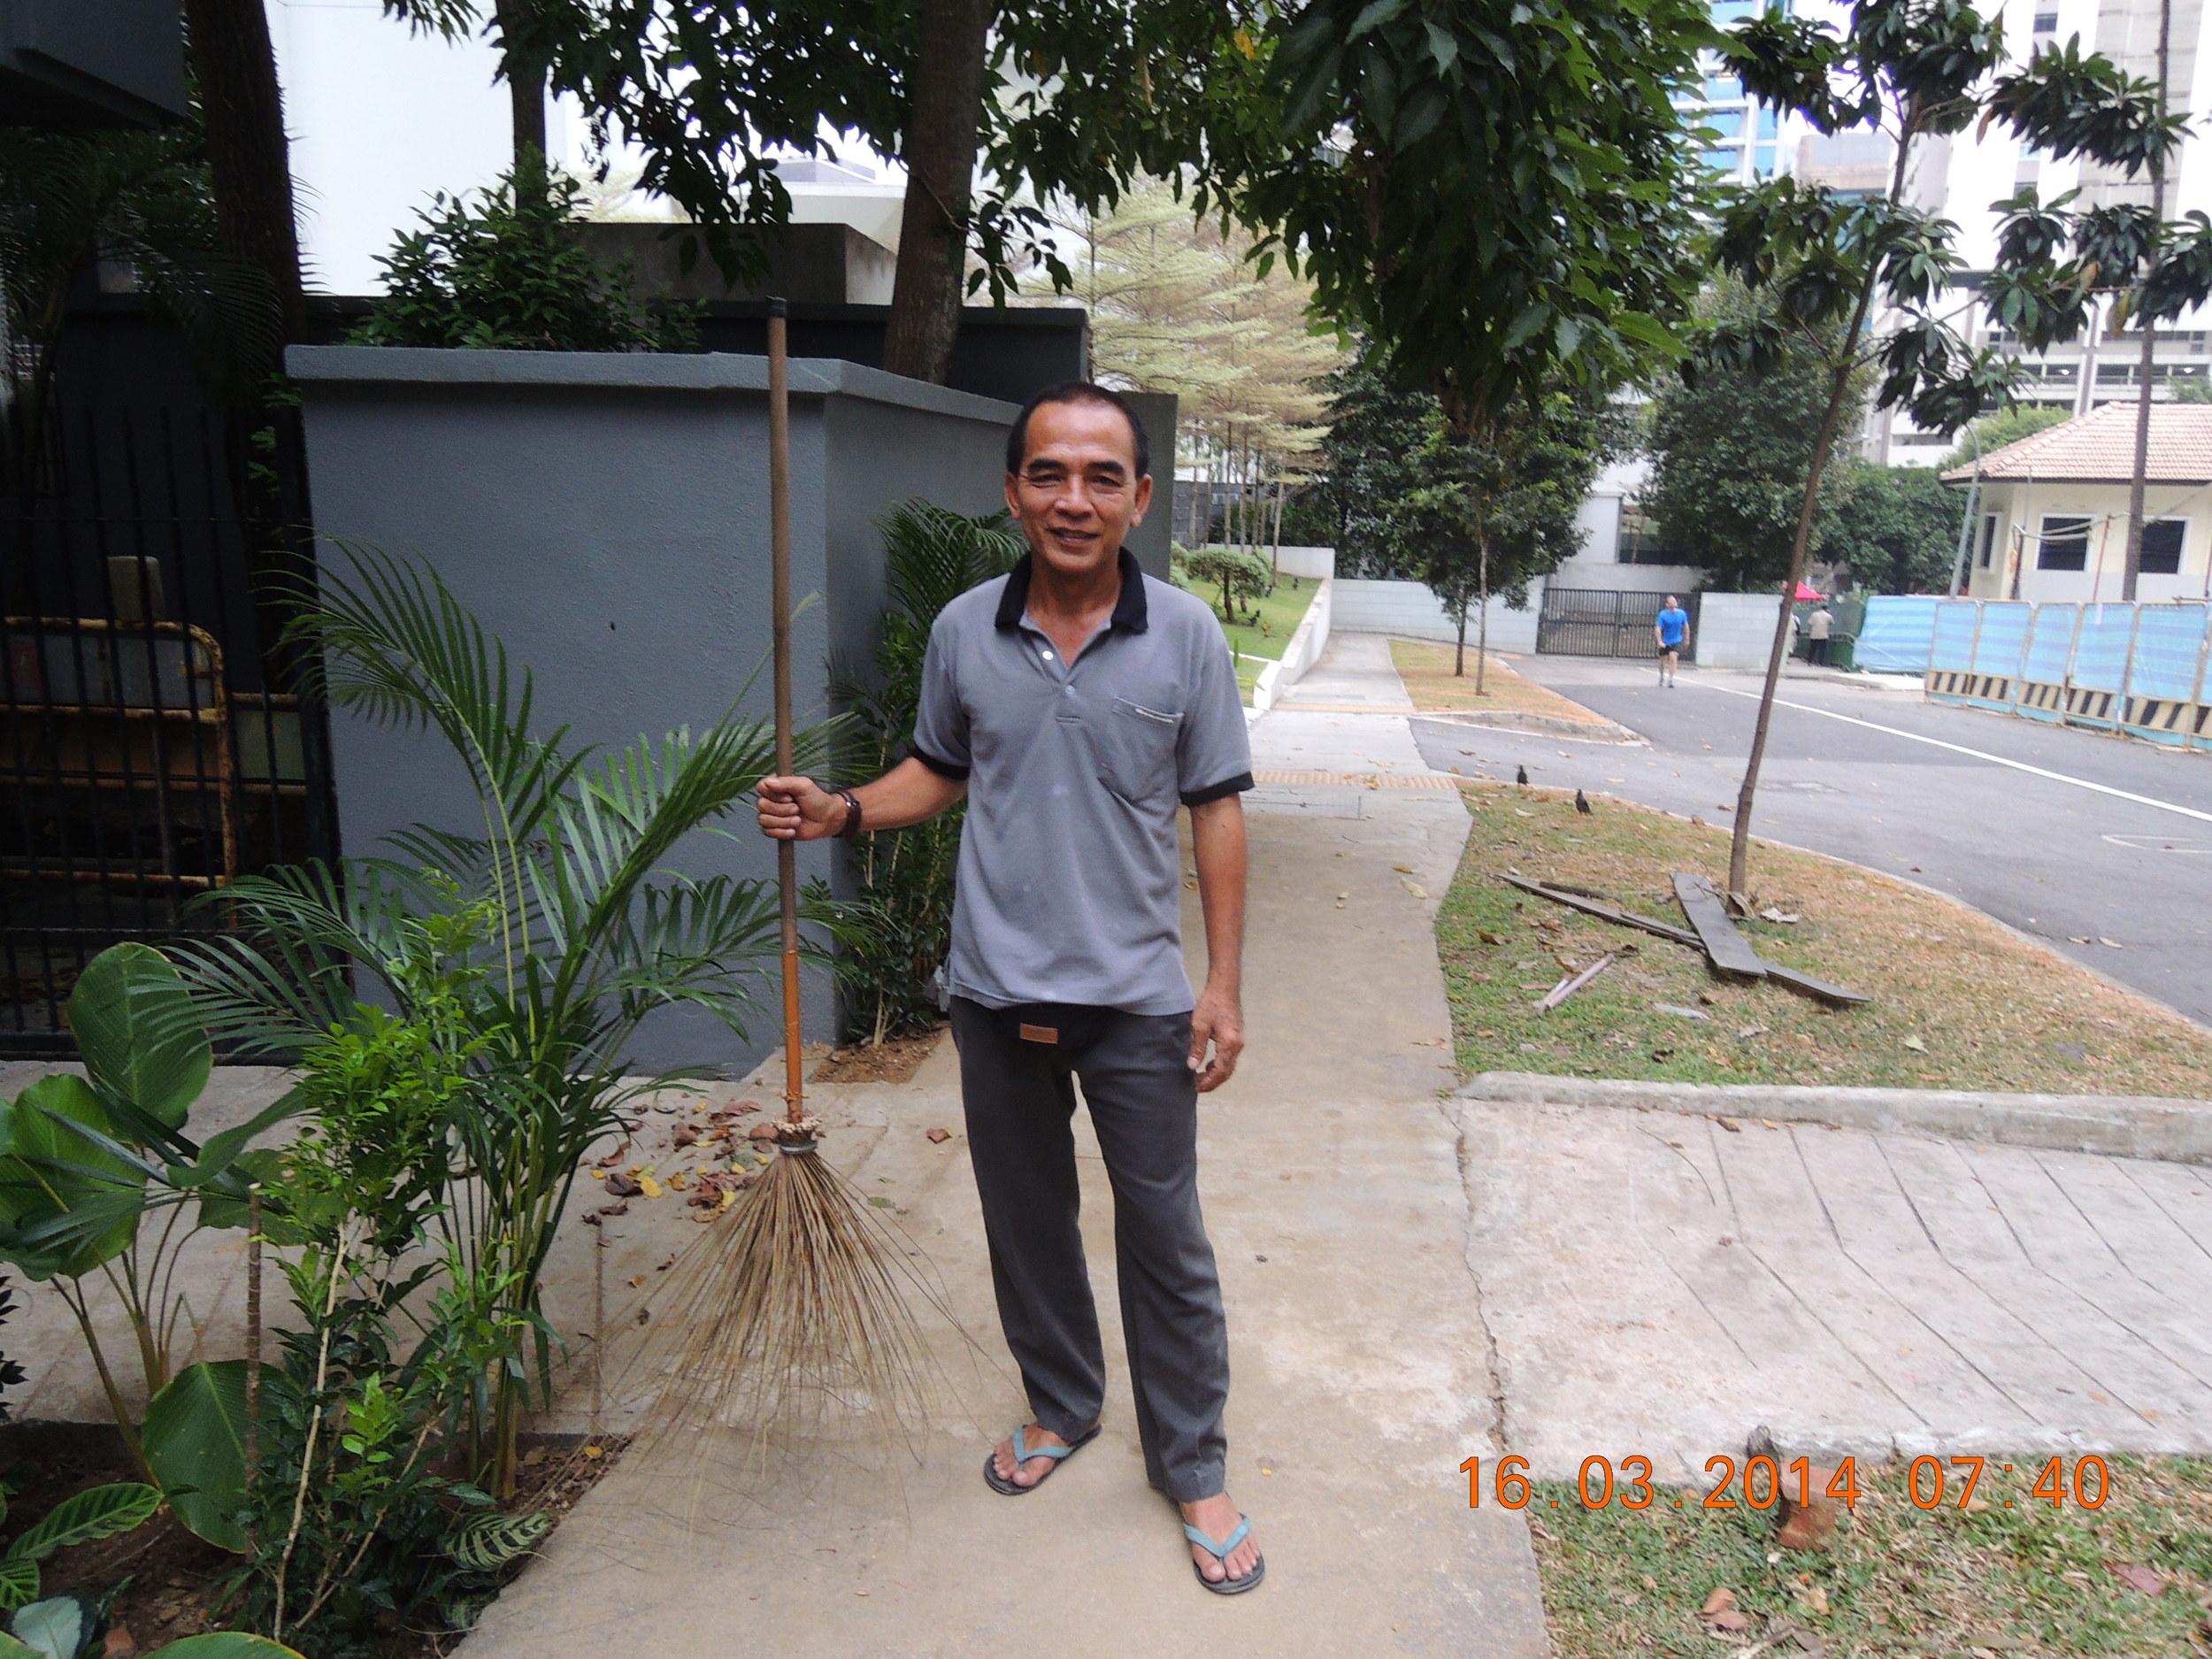 Razzah and his broom.